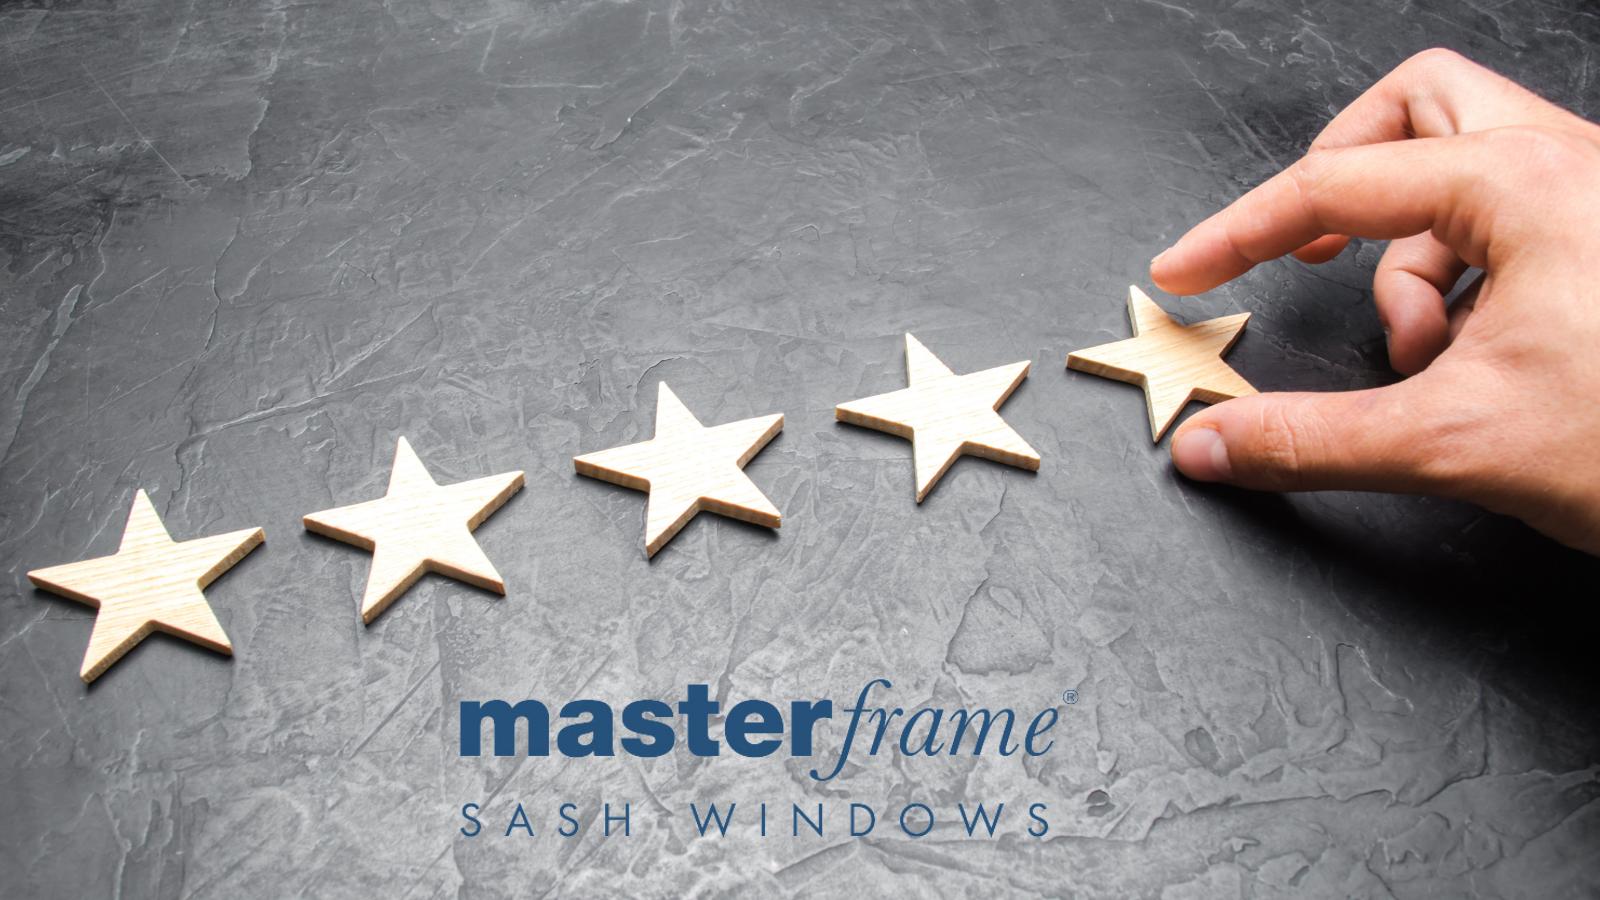 Masterframe five stars